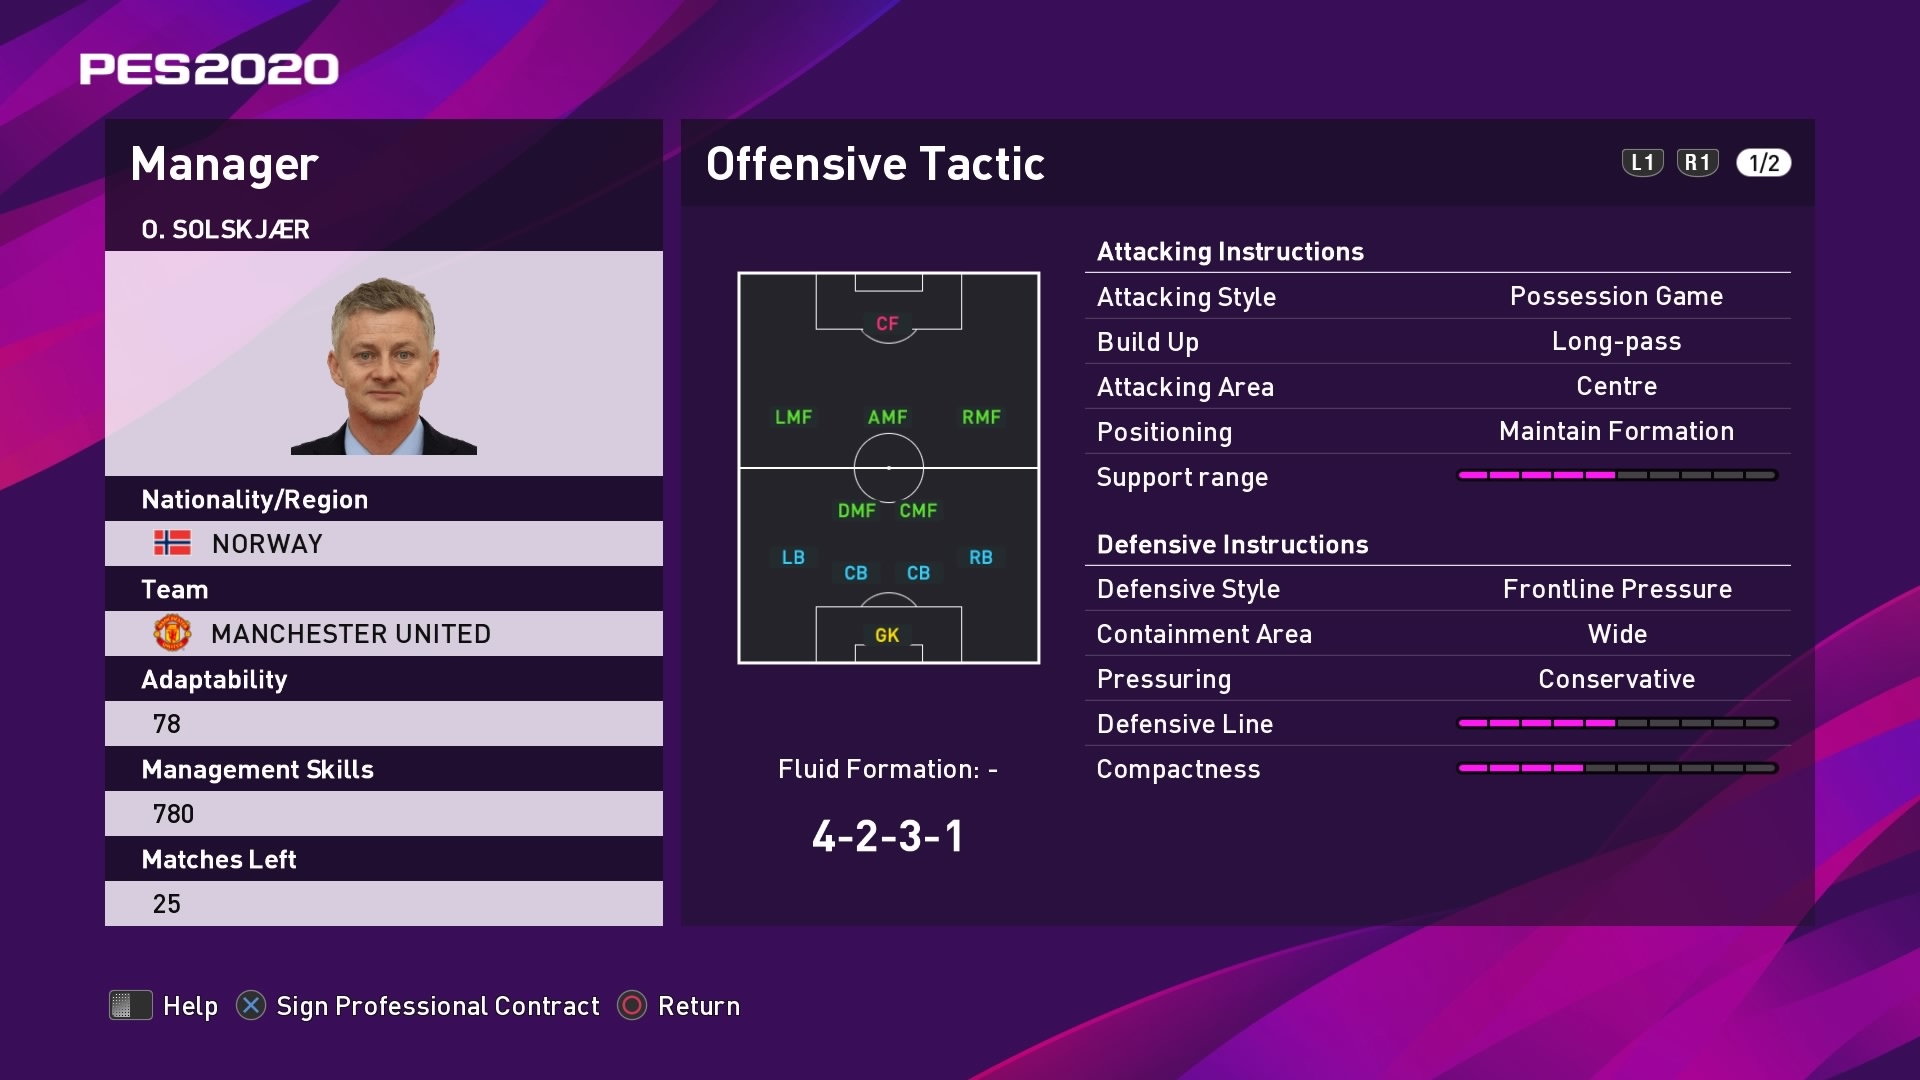 O. Solskjaer (Ole Gunnar Solskjær) Offensive Tactic in PES 2020 myClub